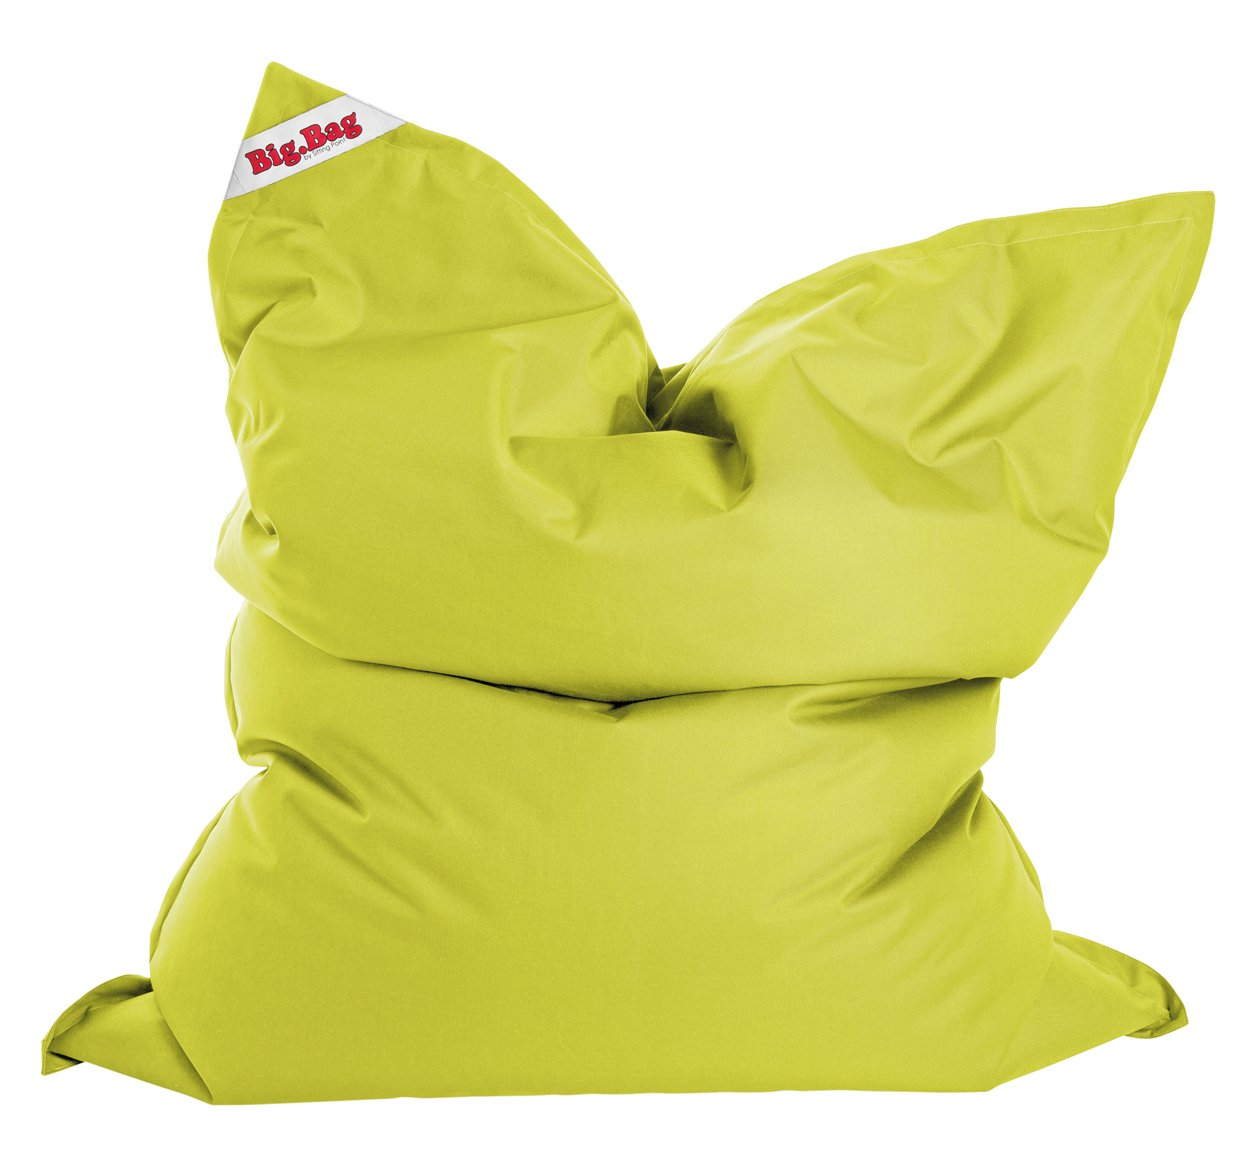 Sitzsack Brava Big Bag 130x170cm Grün: Amazon.de: Küche U0026 Haushalt Design Inspirations